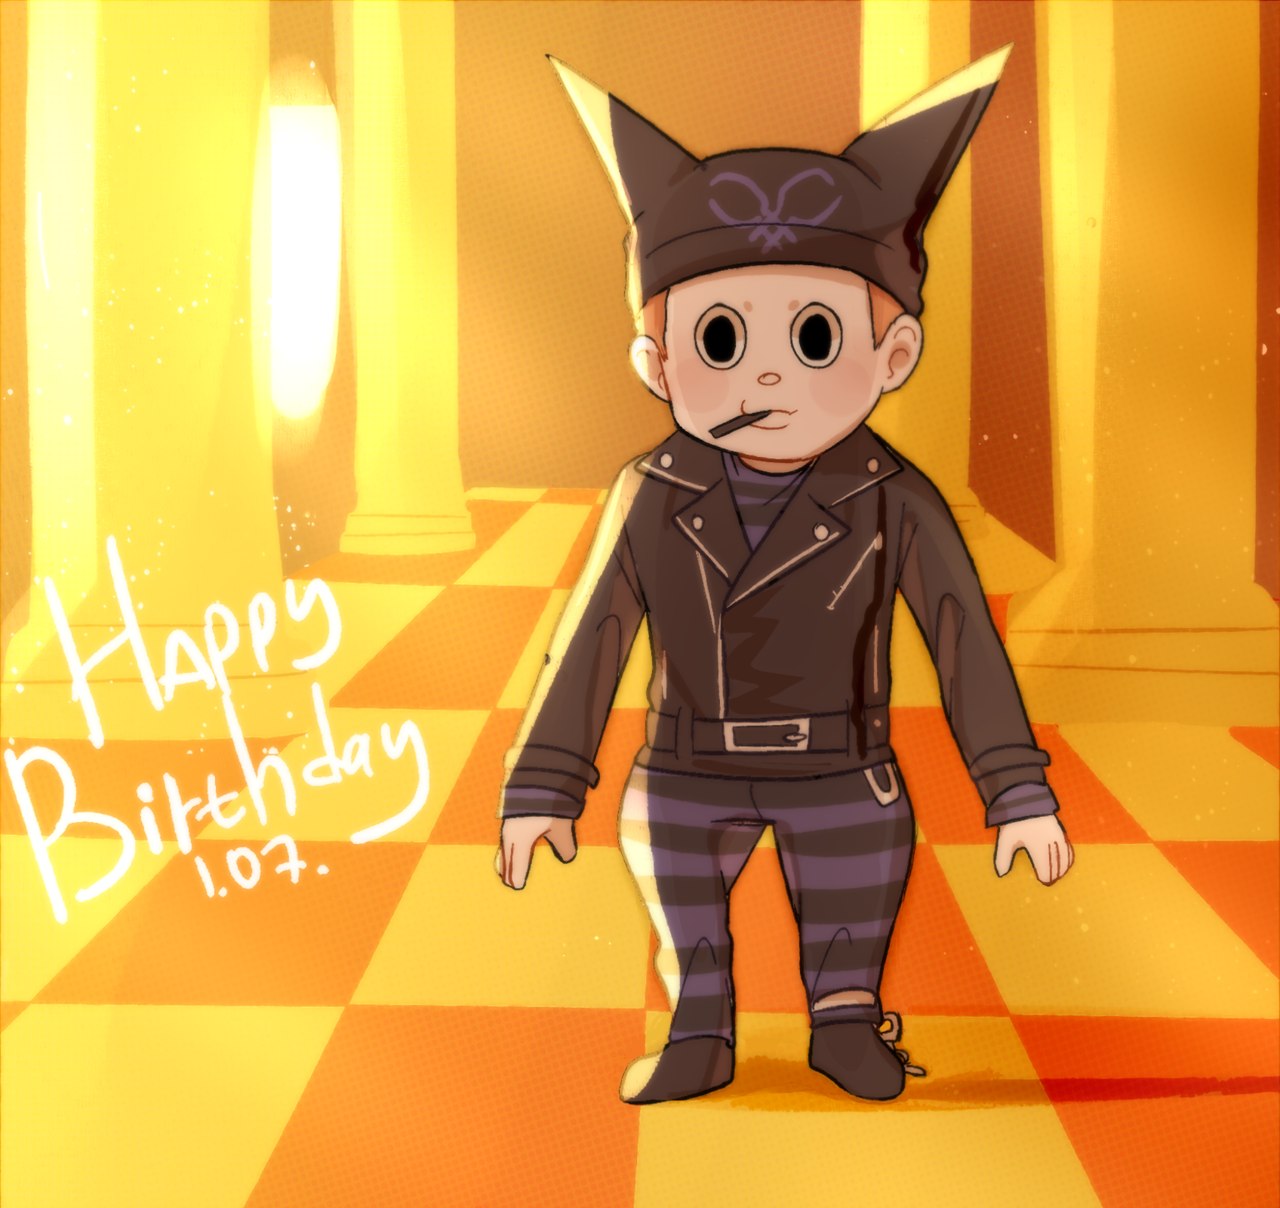 Happy Birthday Ryoma Undertale Ryōma is a japanese given name. happy birthday ryoma undertale